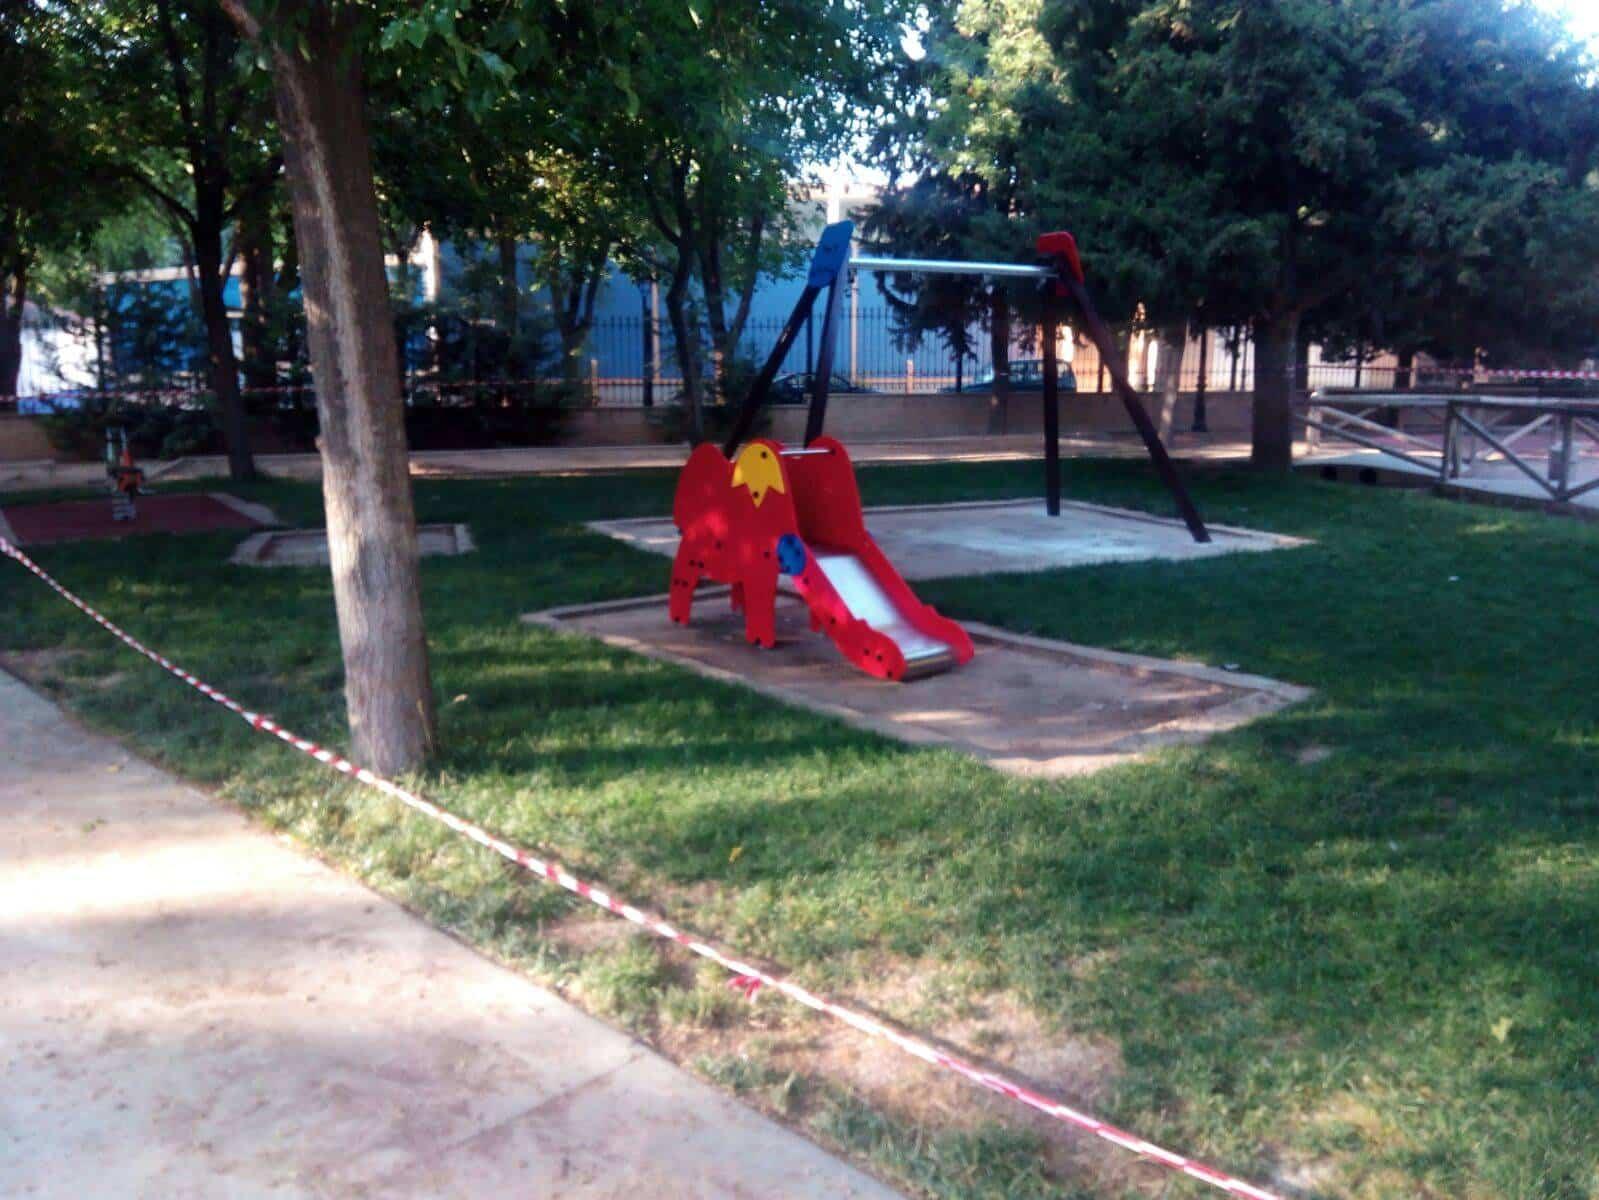 renovada zona infantil parque municipal herencia 1 - Renovada la zona infantil del Parque Municipal de Herencia